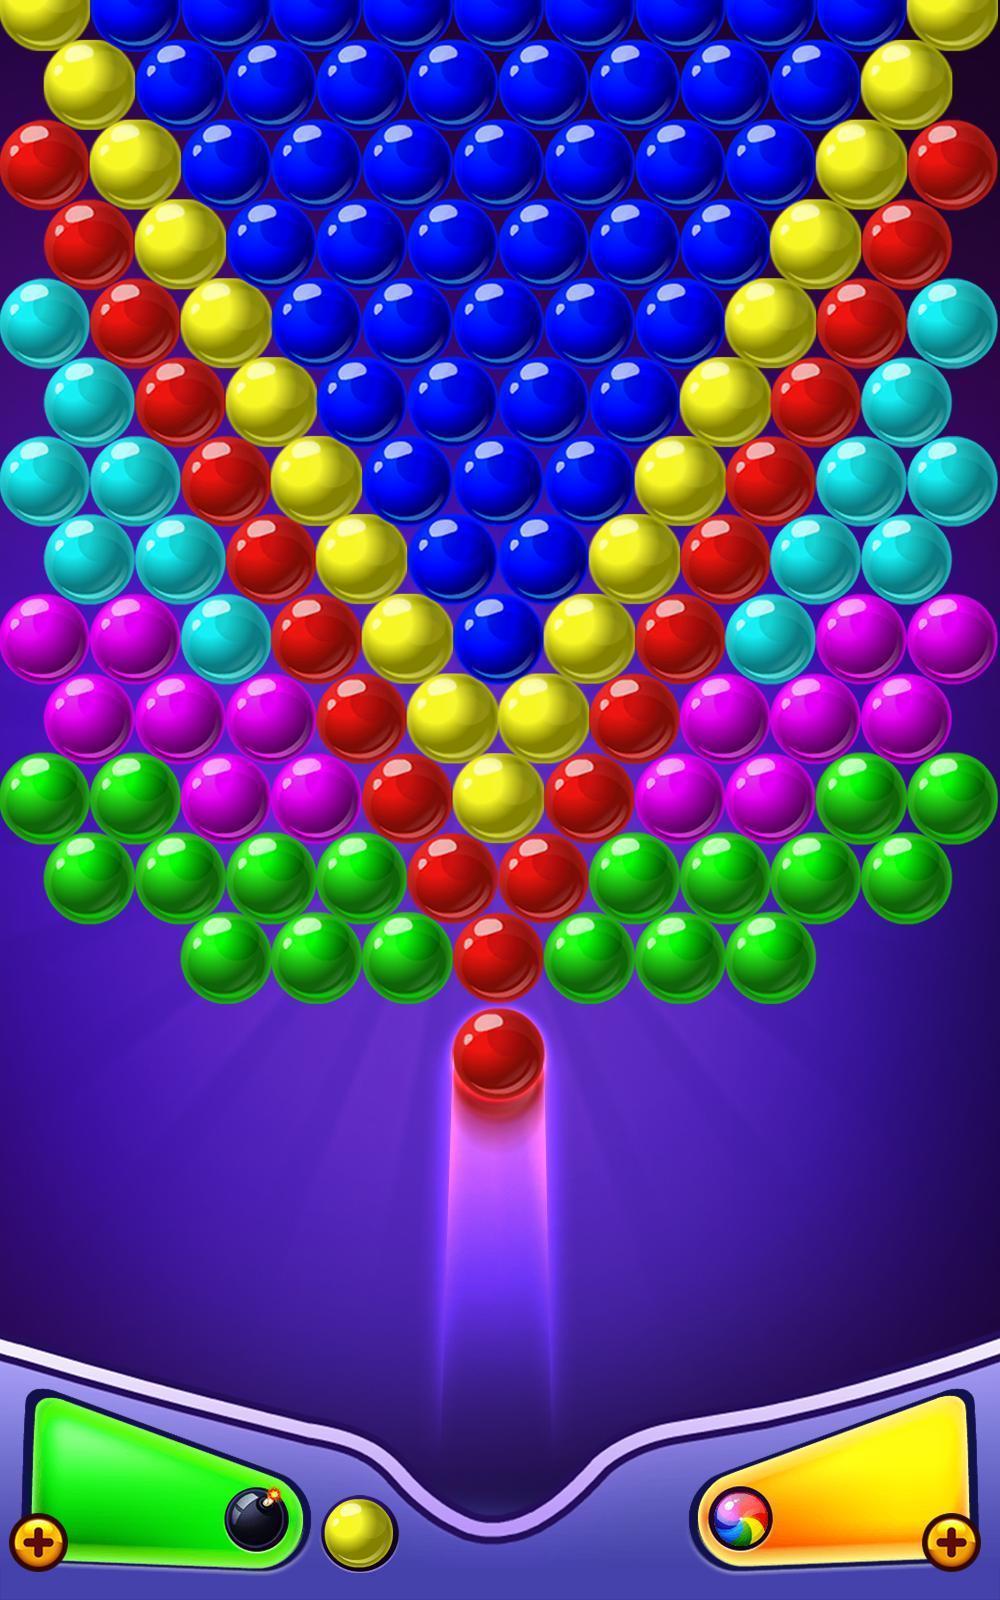 Bubble Shooters - Pop the bubbles 1.2.4 Screenshot 2